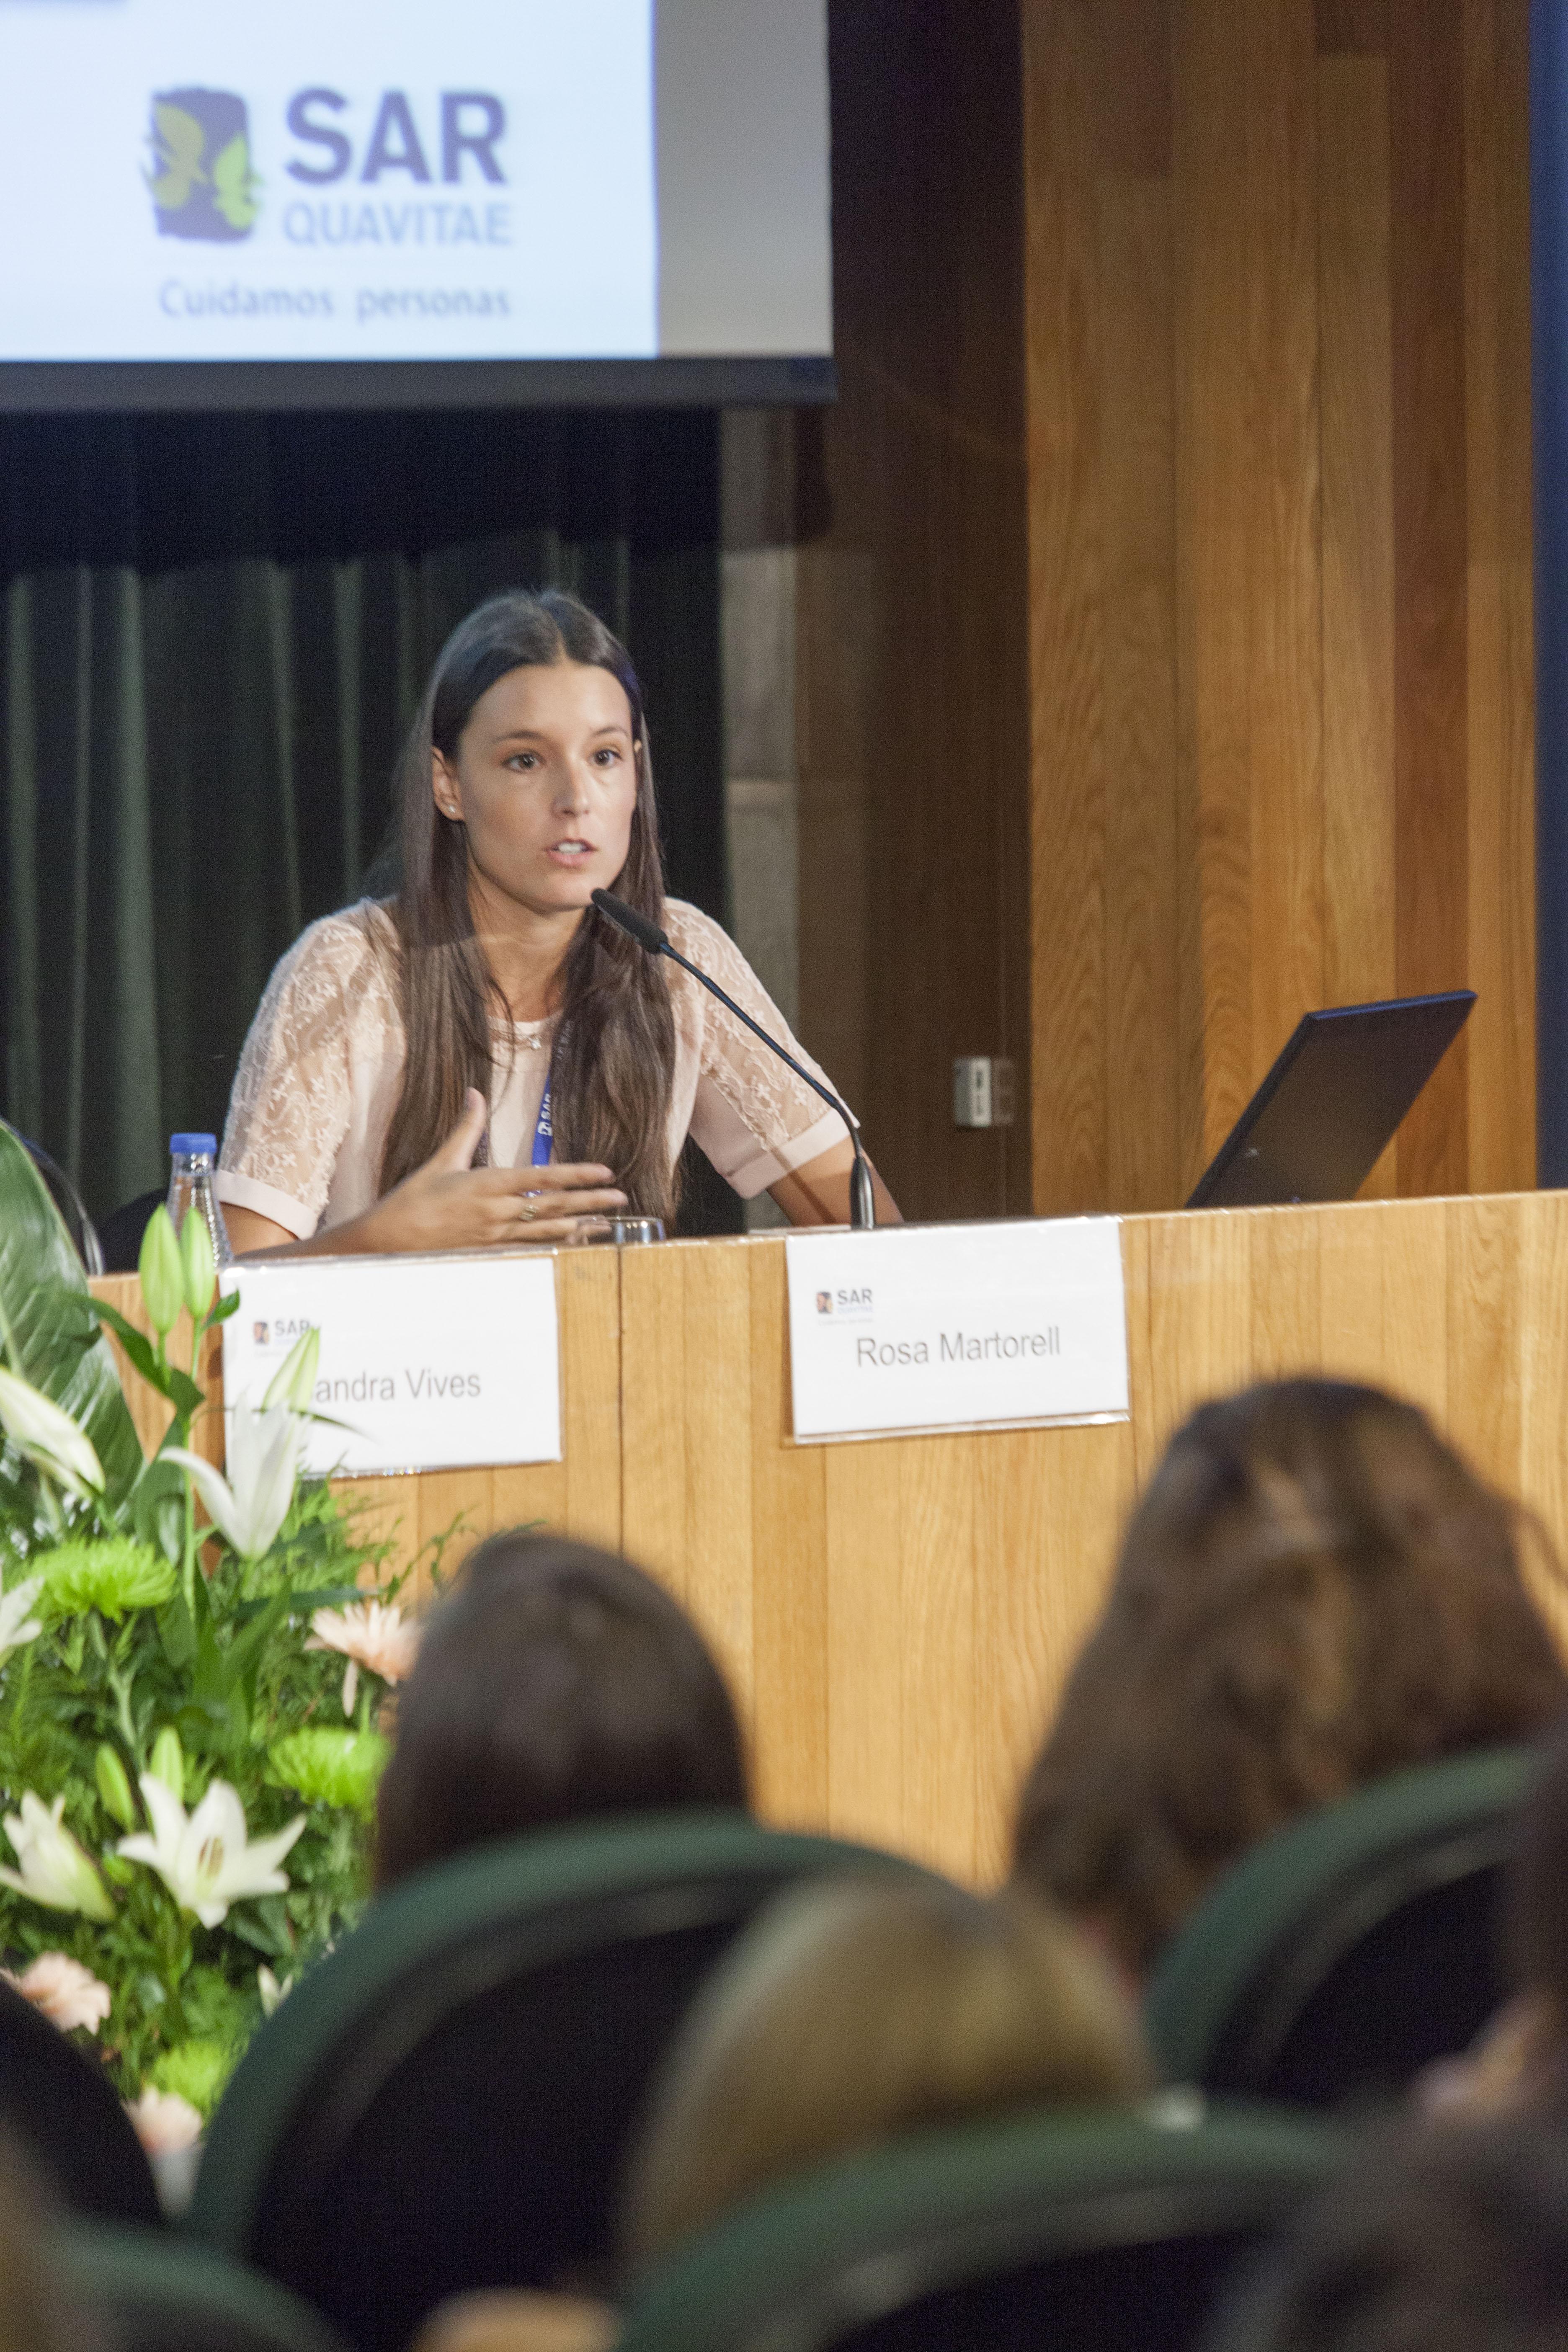 14-10-2014 Jornada SarQuavitae Palma de Mallorca 15